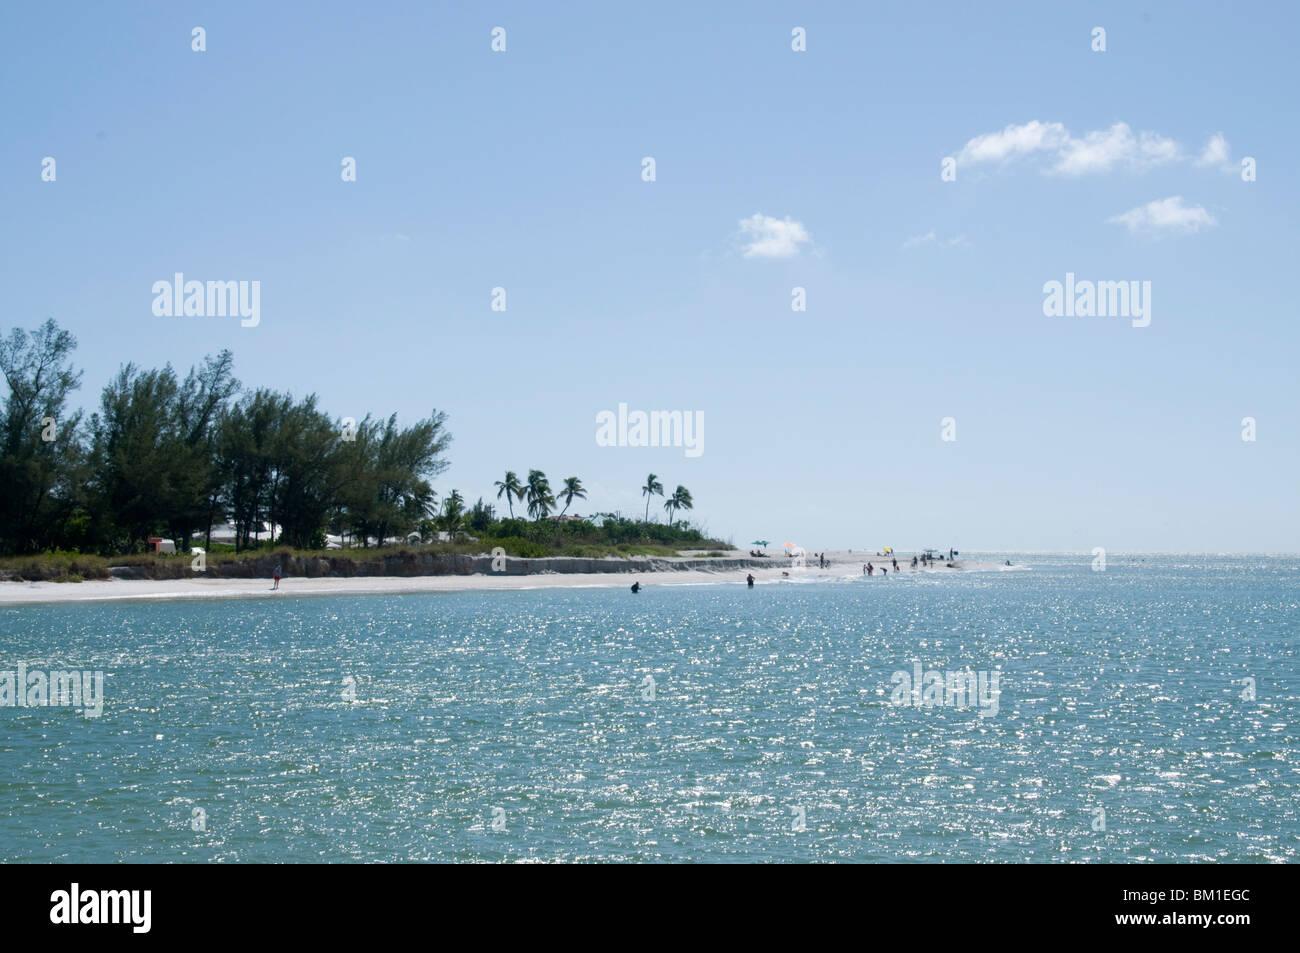 Beach, Sanibel Island, Gulf Coast, Florida, United States of America, North America - Stock Image